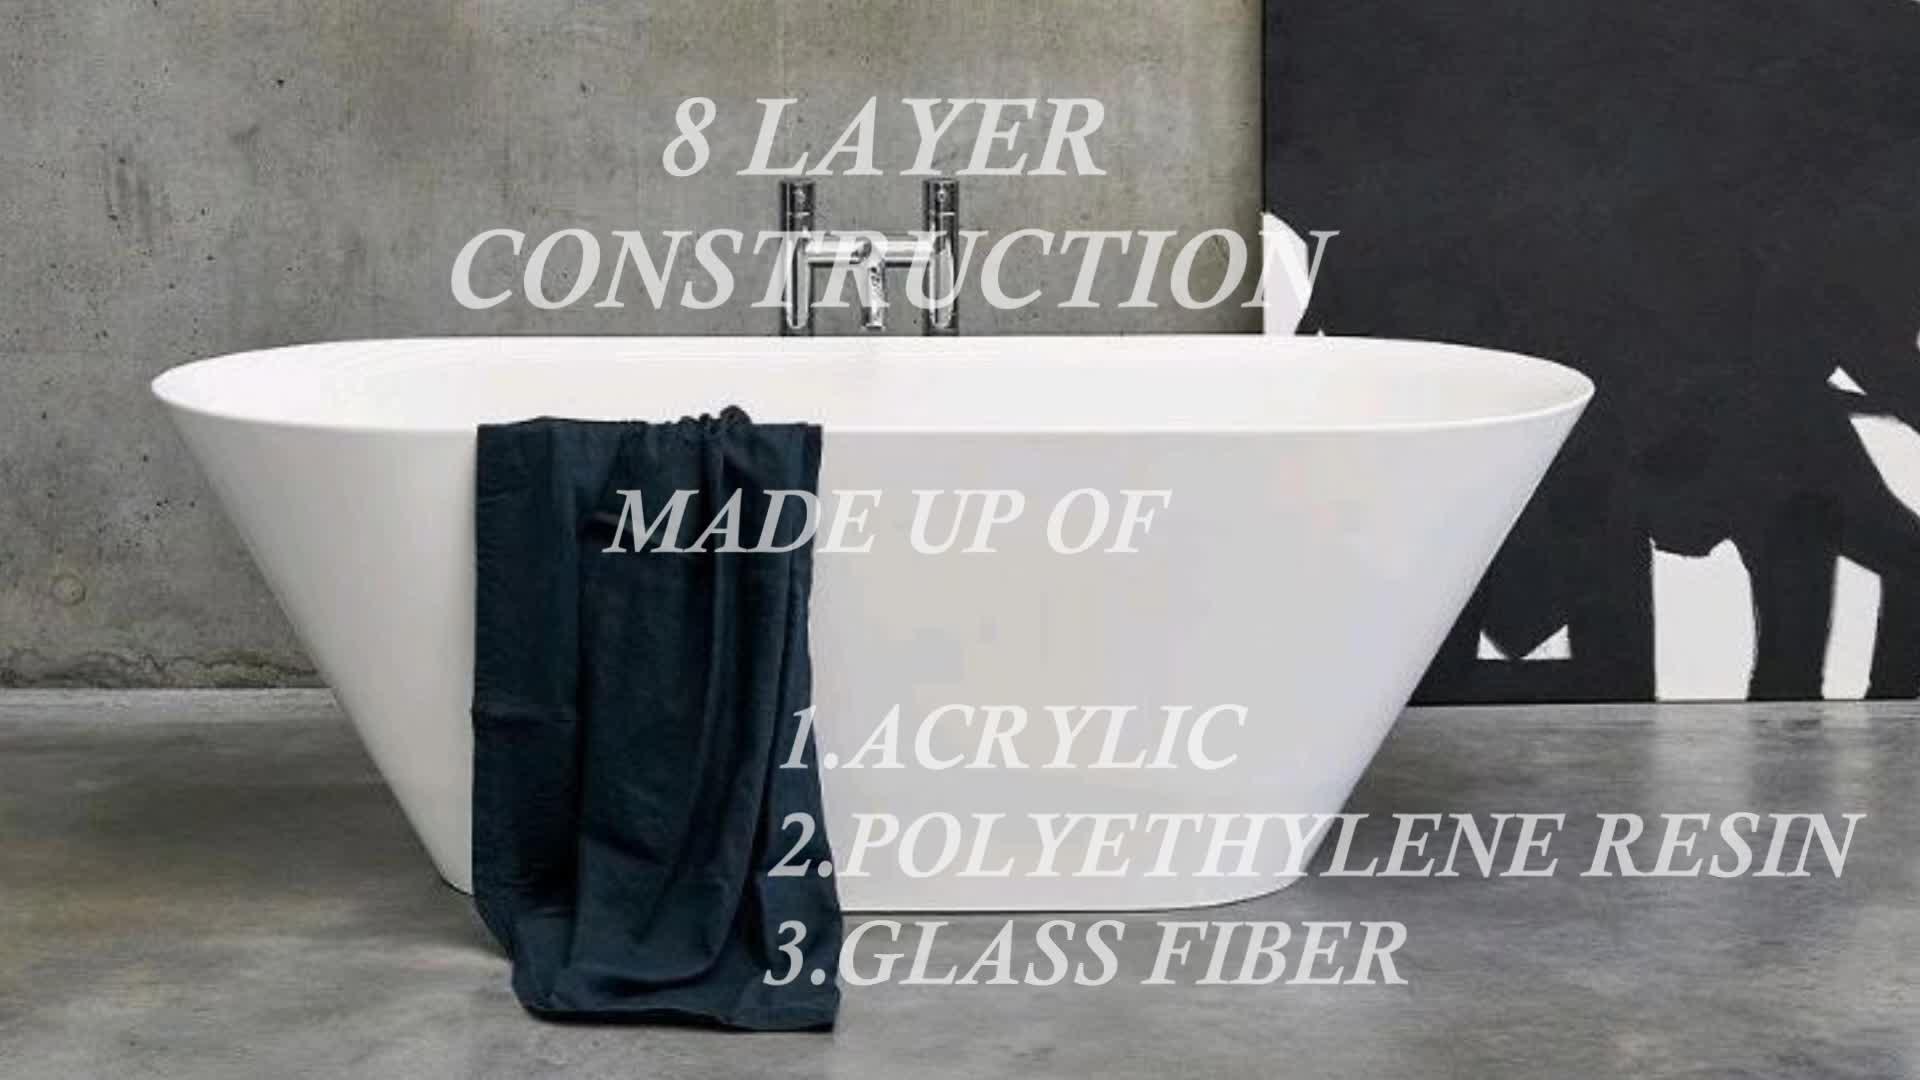 Aifol 安いベビープラスチック浴槽浴槽、子供アクリルバスタブ、深い繊維浴室プラスチックハイドロ浴槽